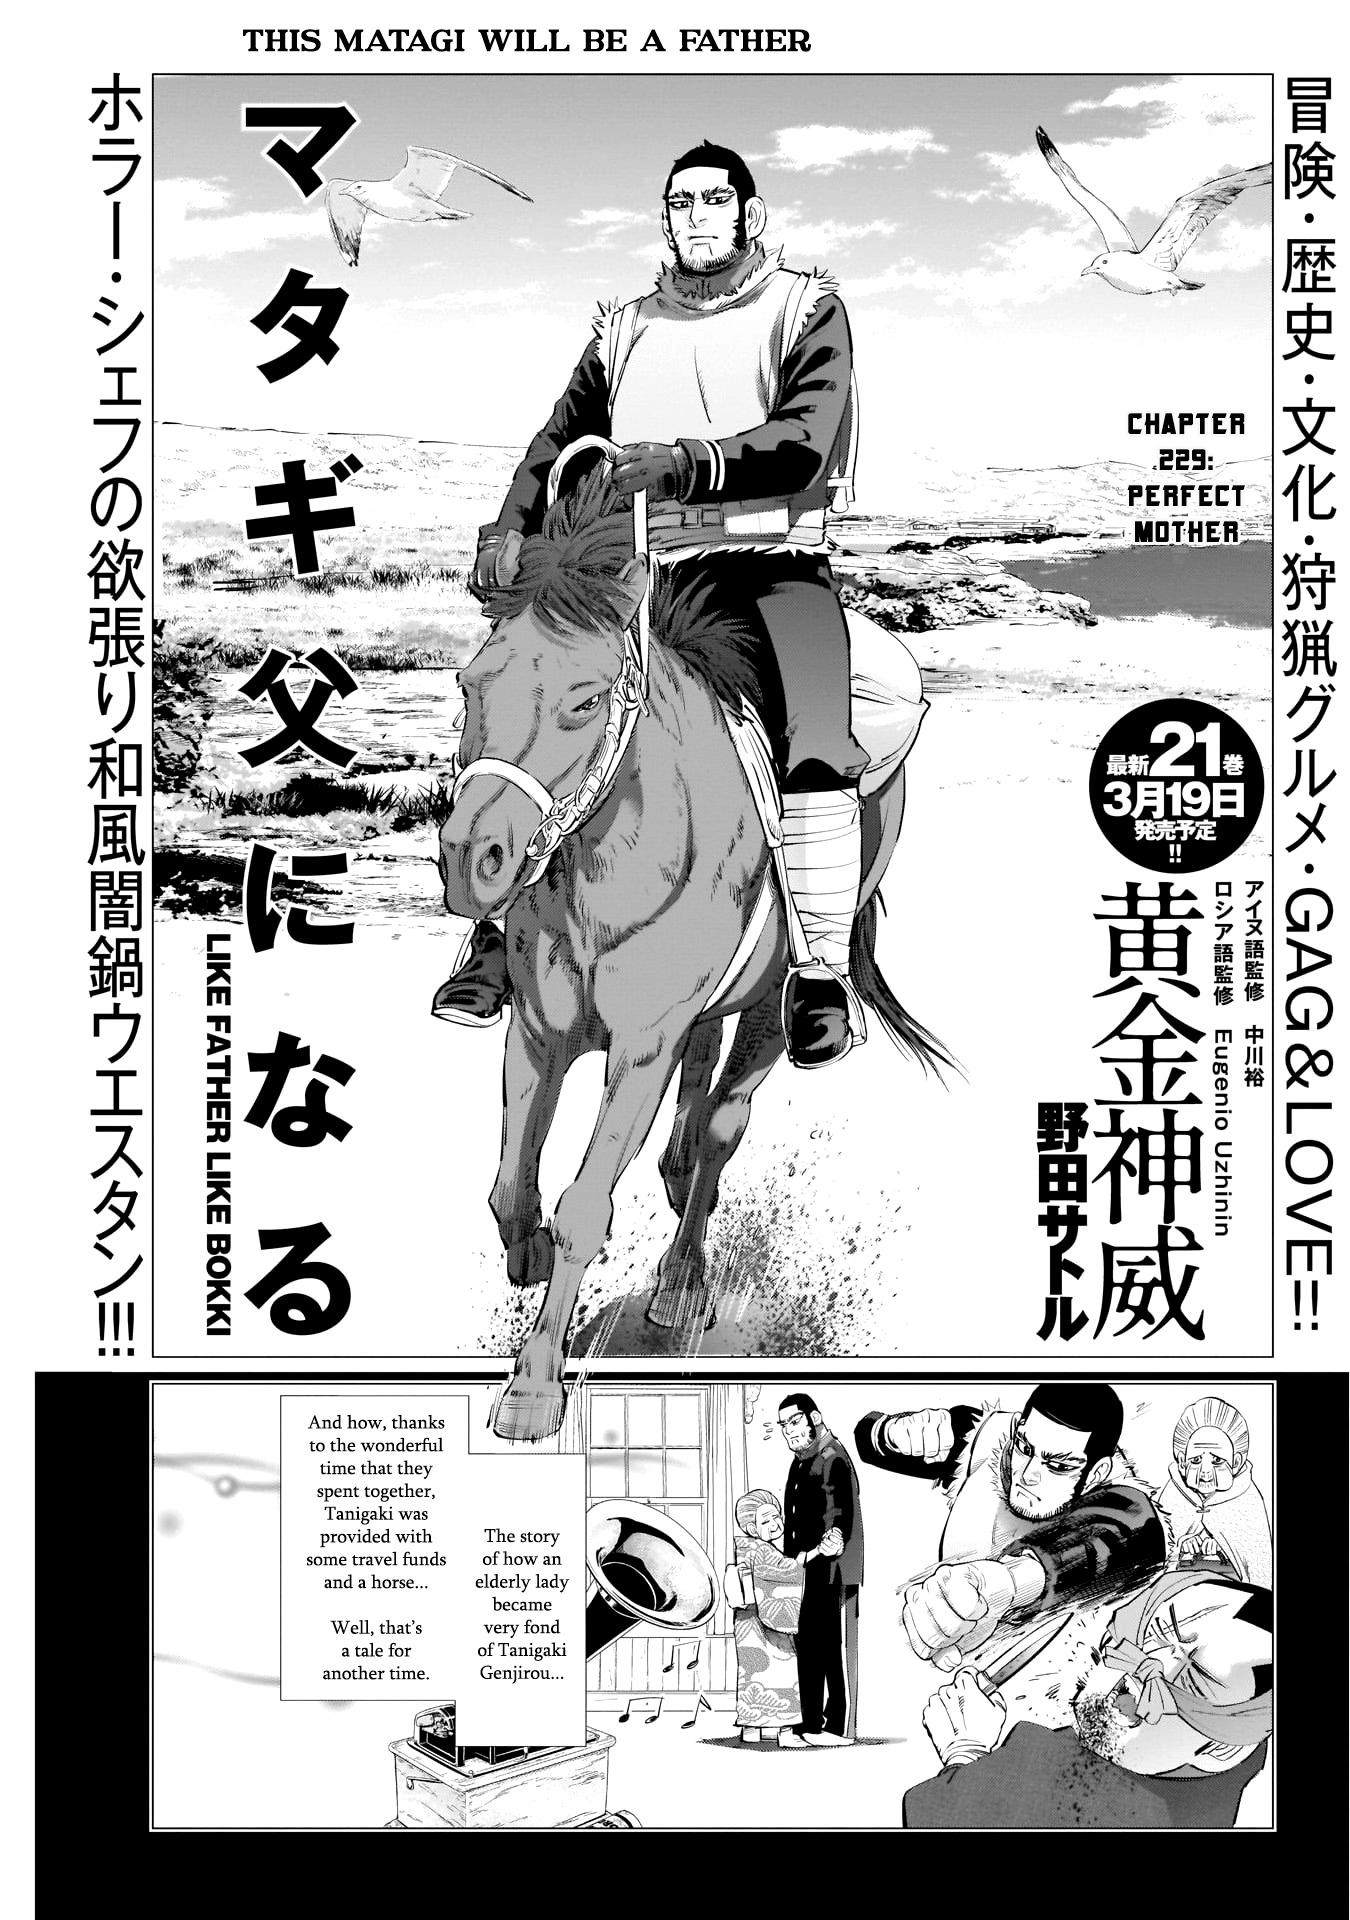 https://manga.mangadogs.com/comics/pic2/26/538/1092168/a19e49f070ffa5602842b056bd2964d9.jpg Page 1